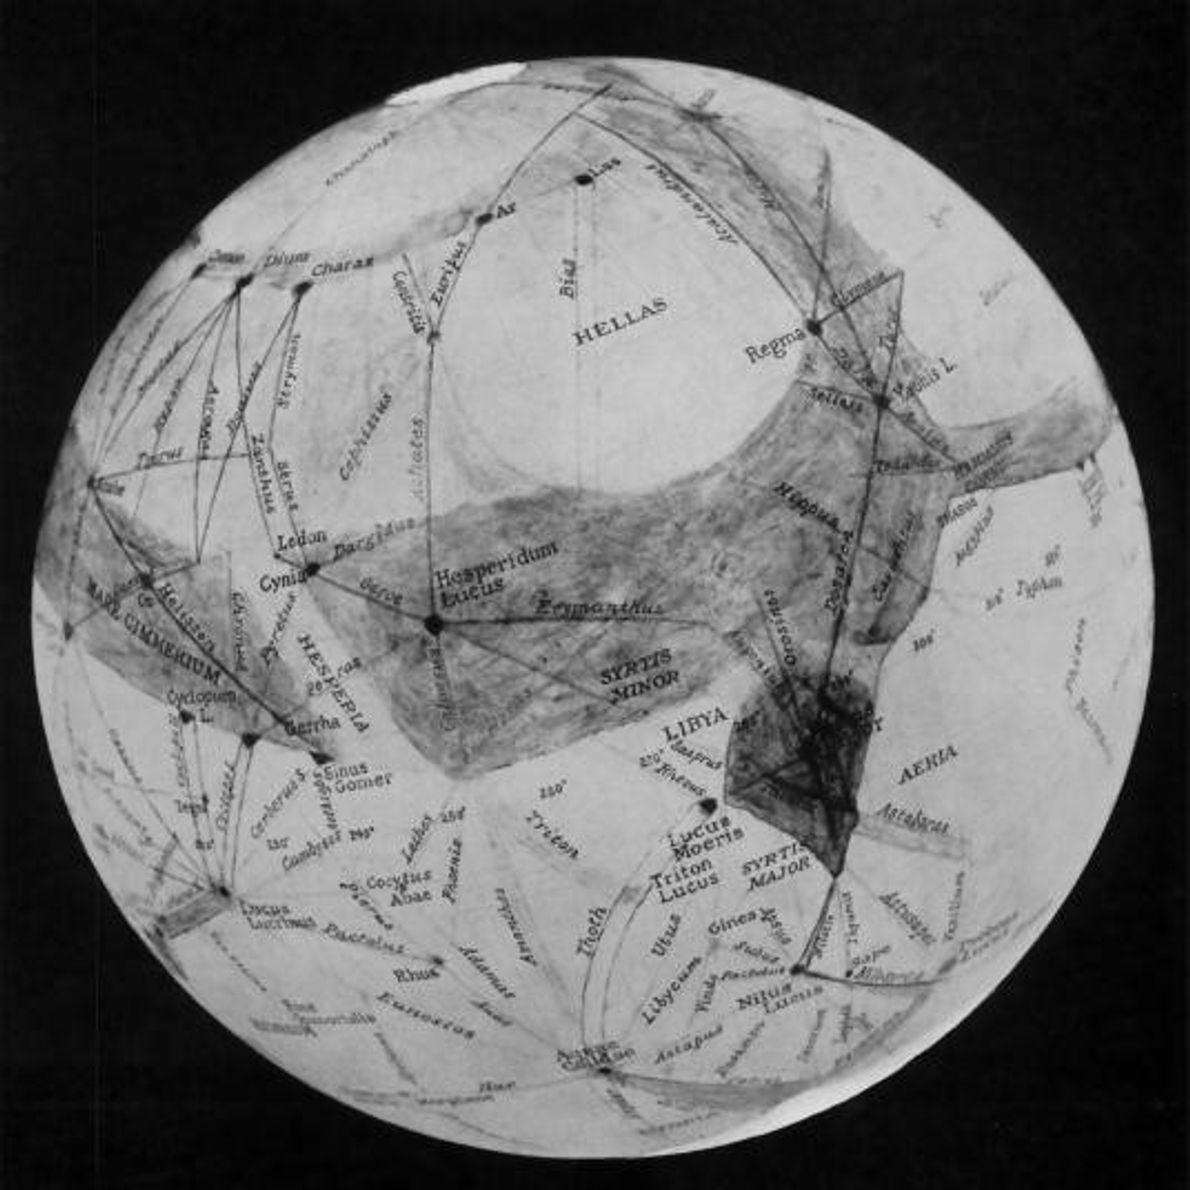 Mapa de Marte de Percival Lowell